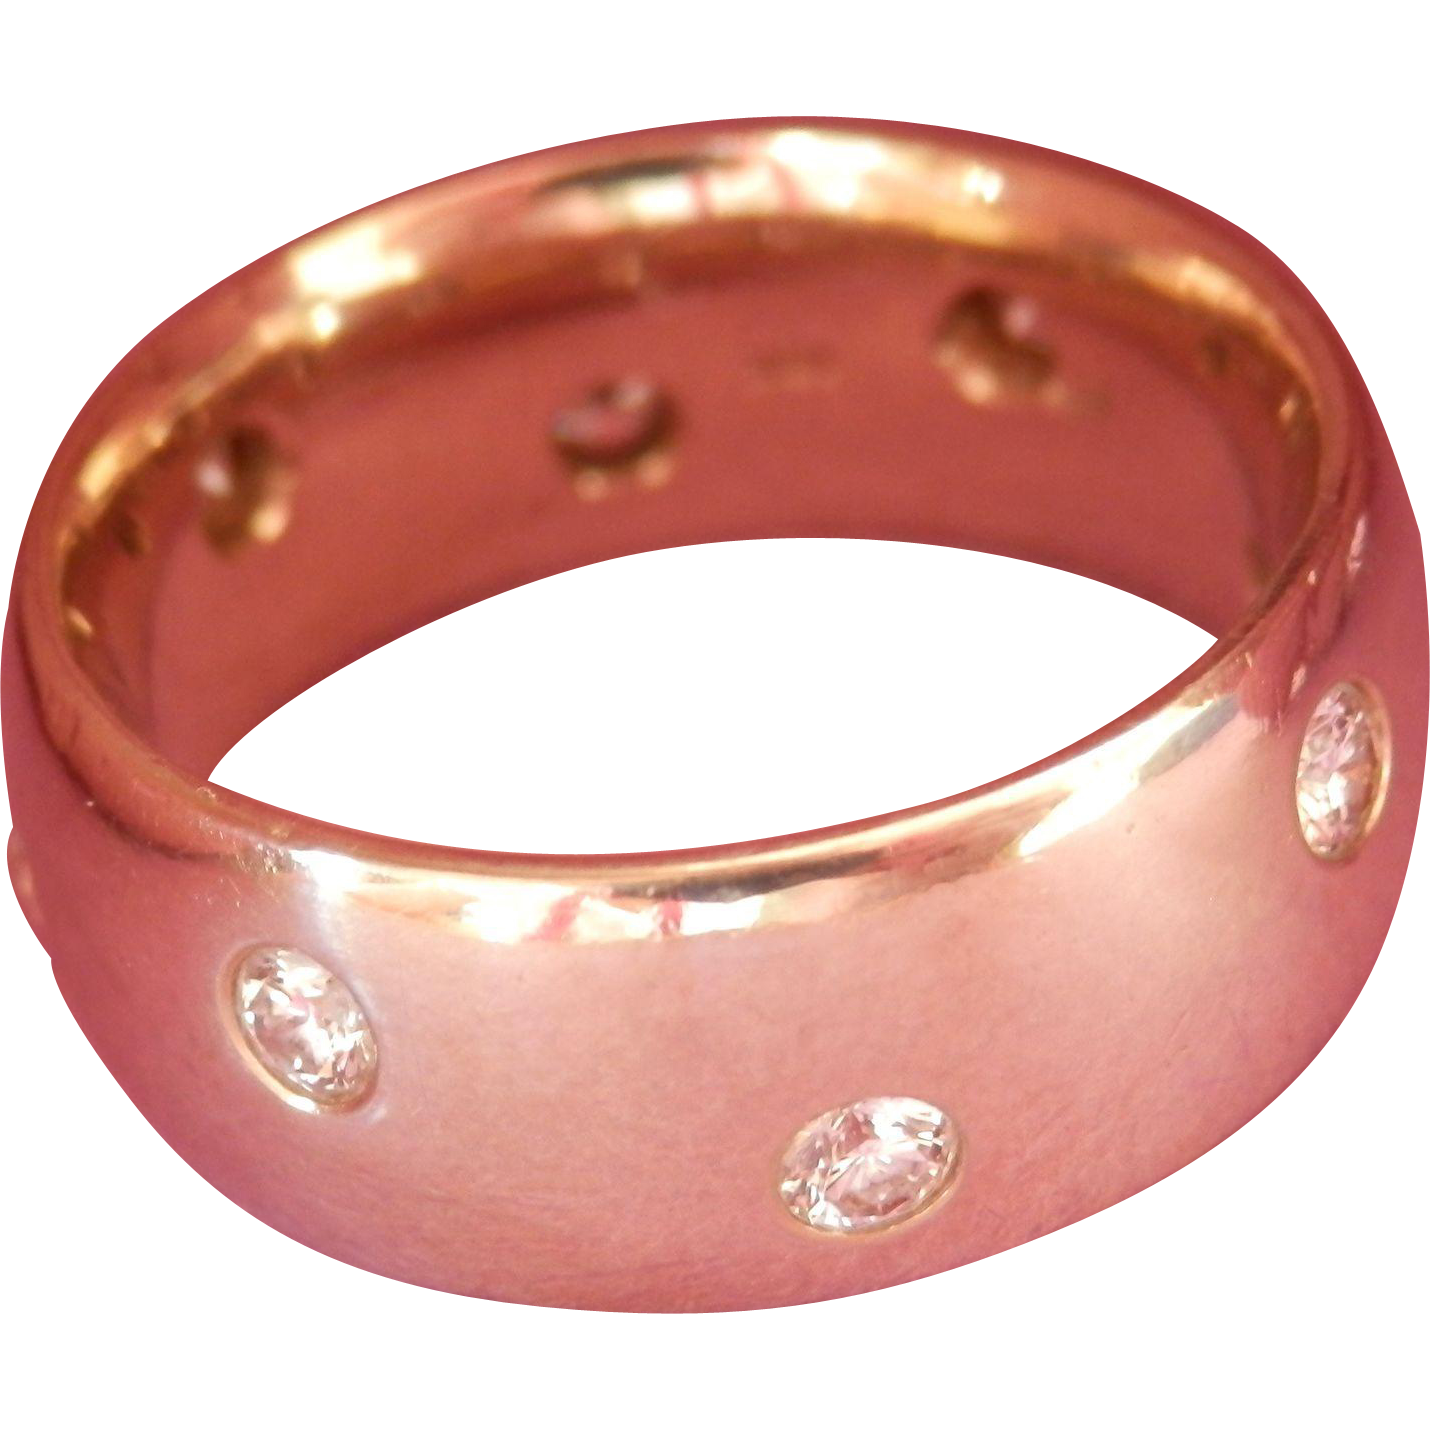 Heavy Wide 18K W/Gold 8-Diamond Etoile Band Ring~11.6 grams!